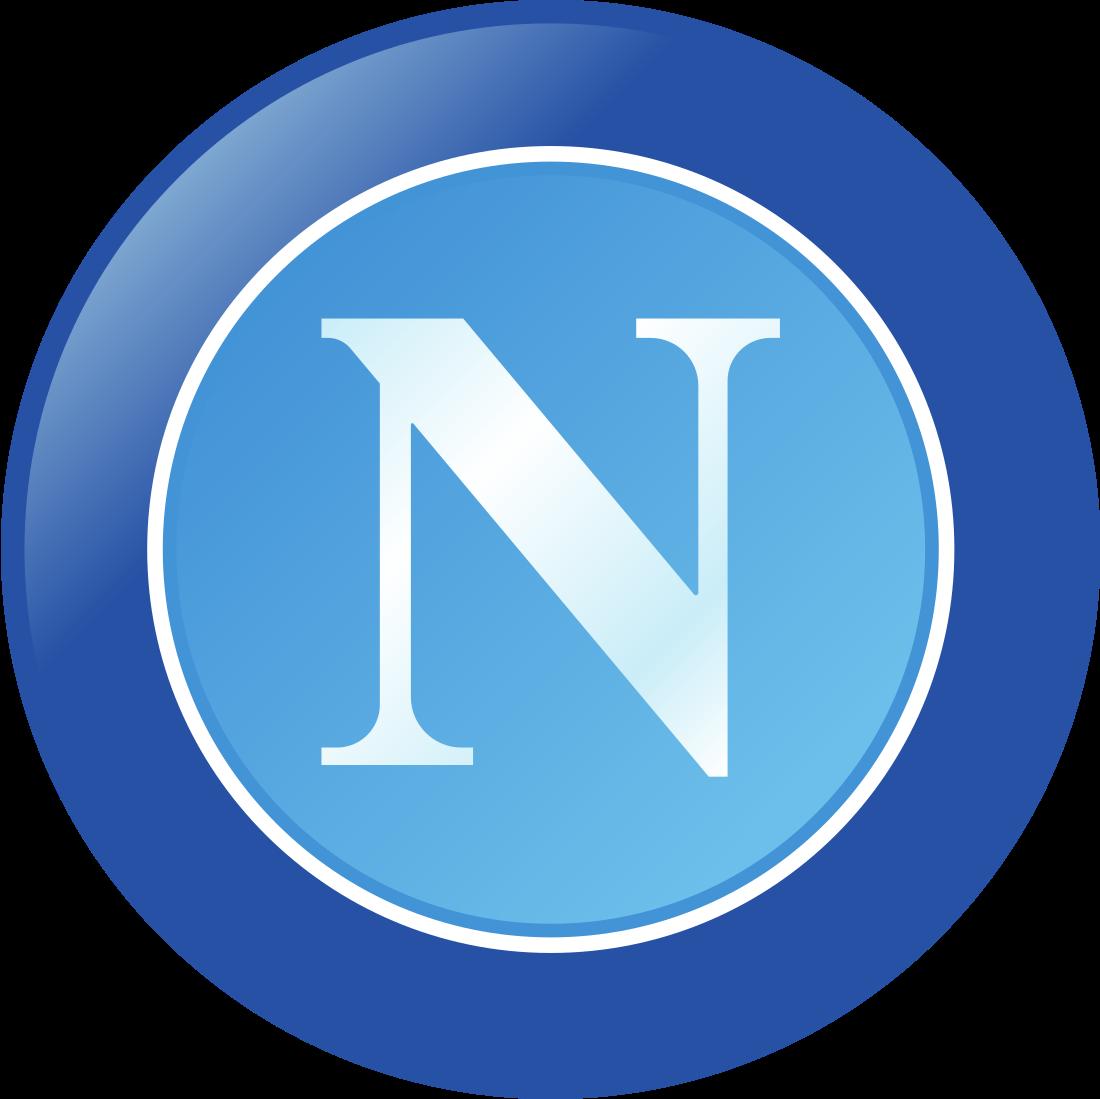 napoli-logo-escudo-3